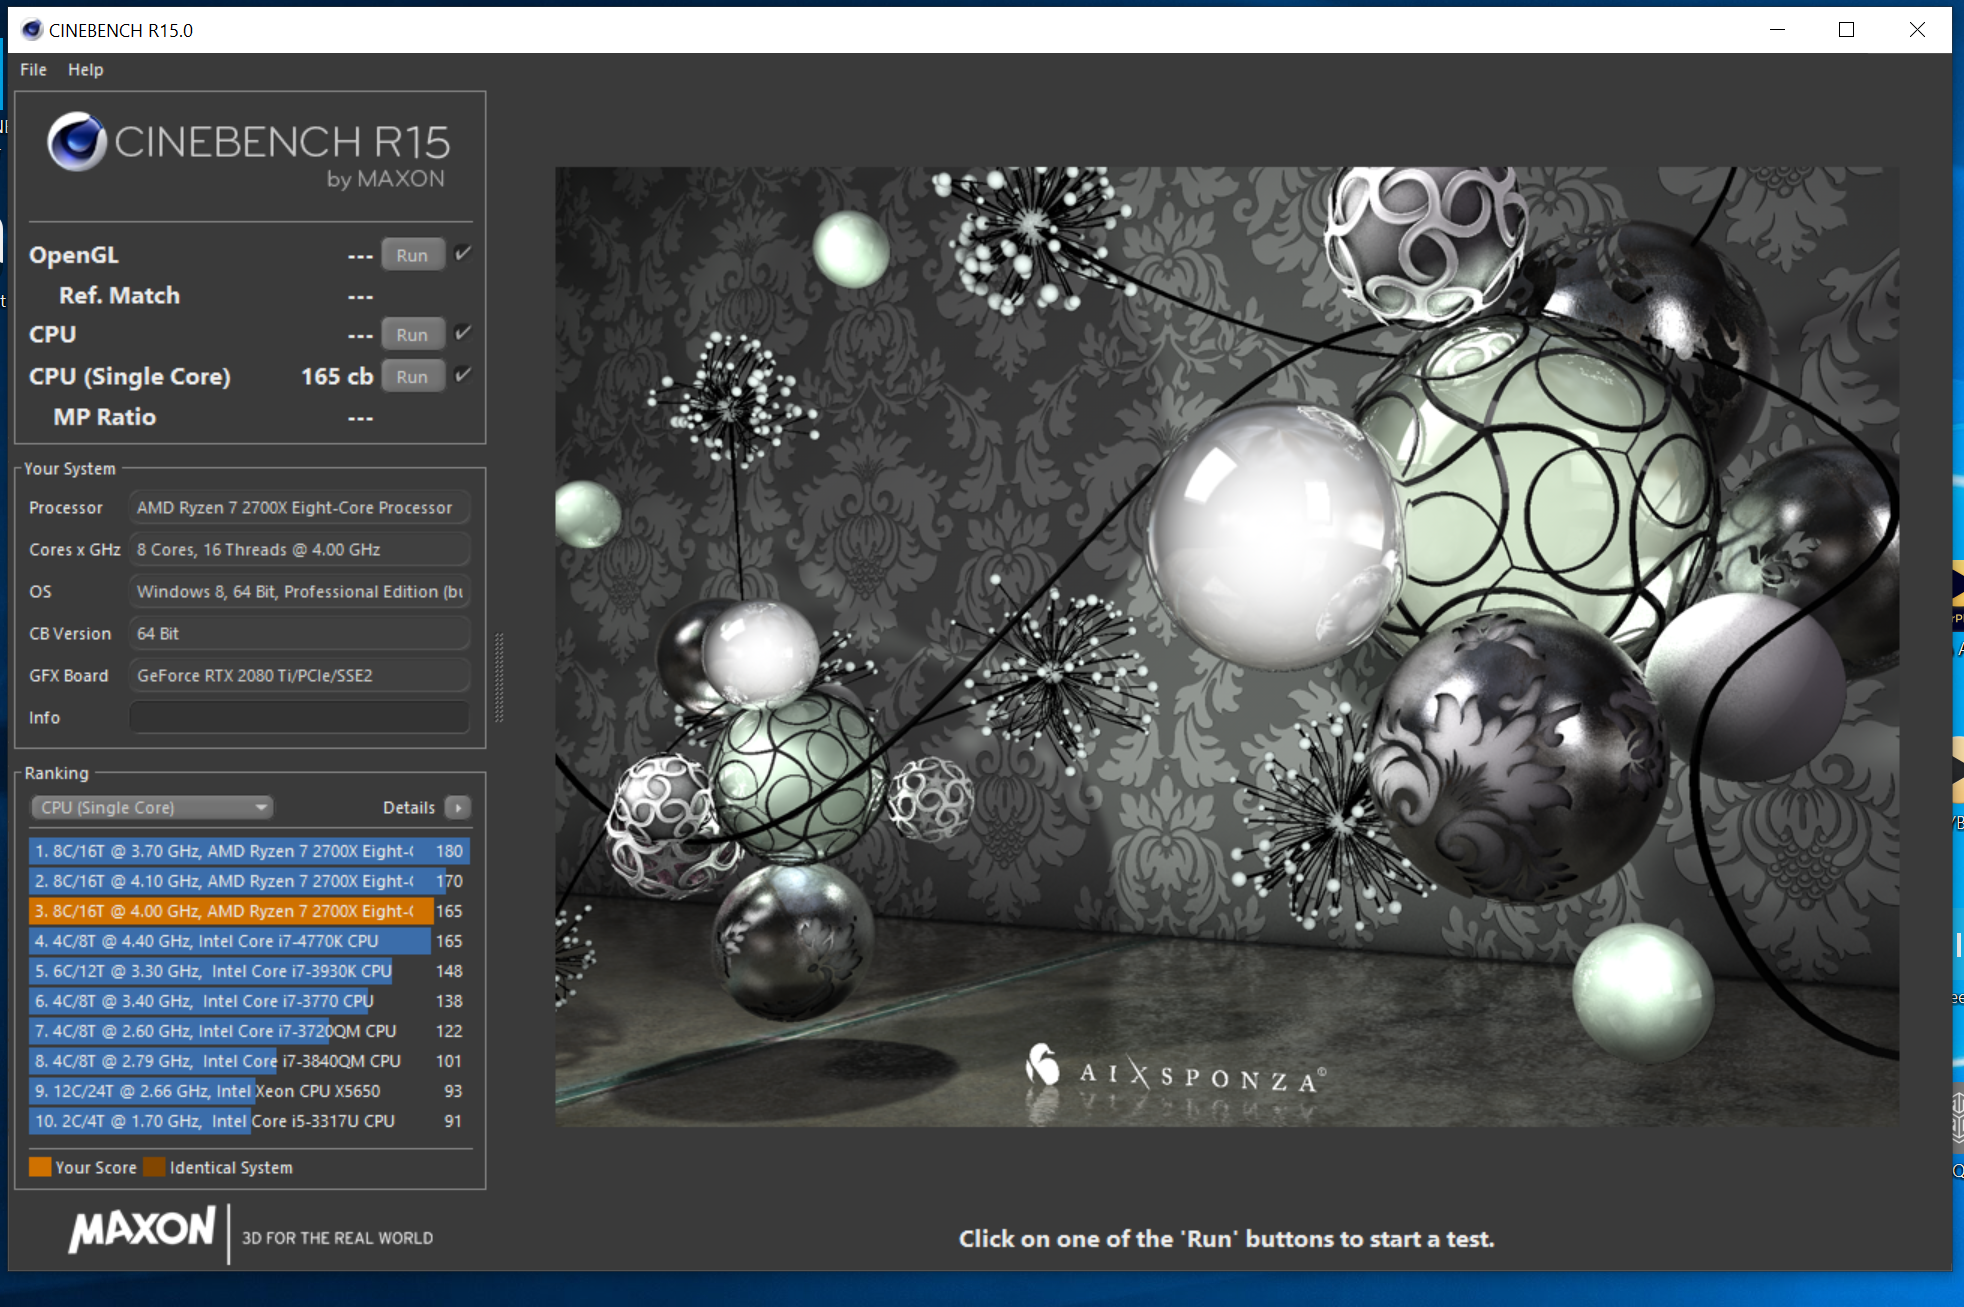 Desktop Screenshot 2021.03.05 - 19.47.44.18.png